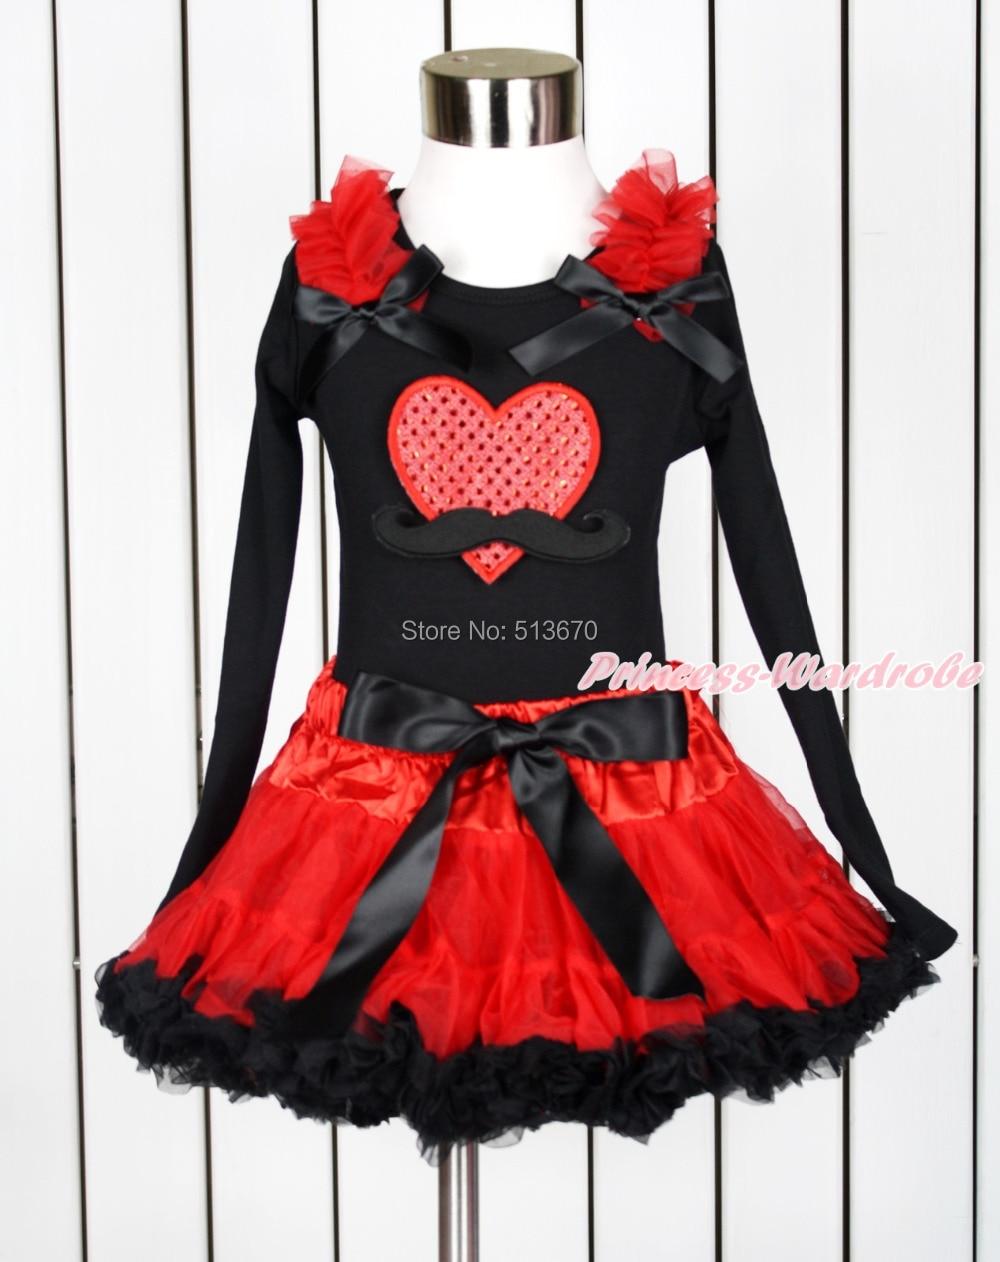 Valentine Mustache Sparkle Red Heart Black Top Hot Red Black Pettiskirt Set 1-8Y MAPSA0113 red black 8 layered pettiskirt red sparkle number ruffle red bow tank top mamg575